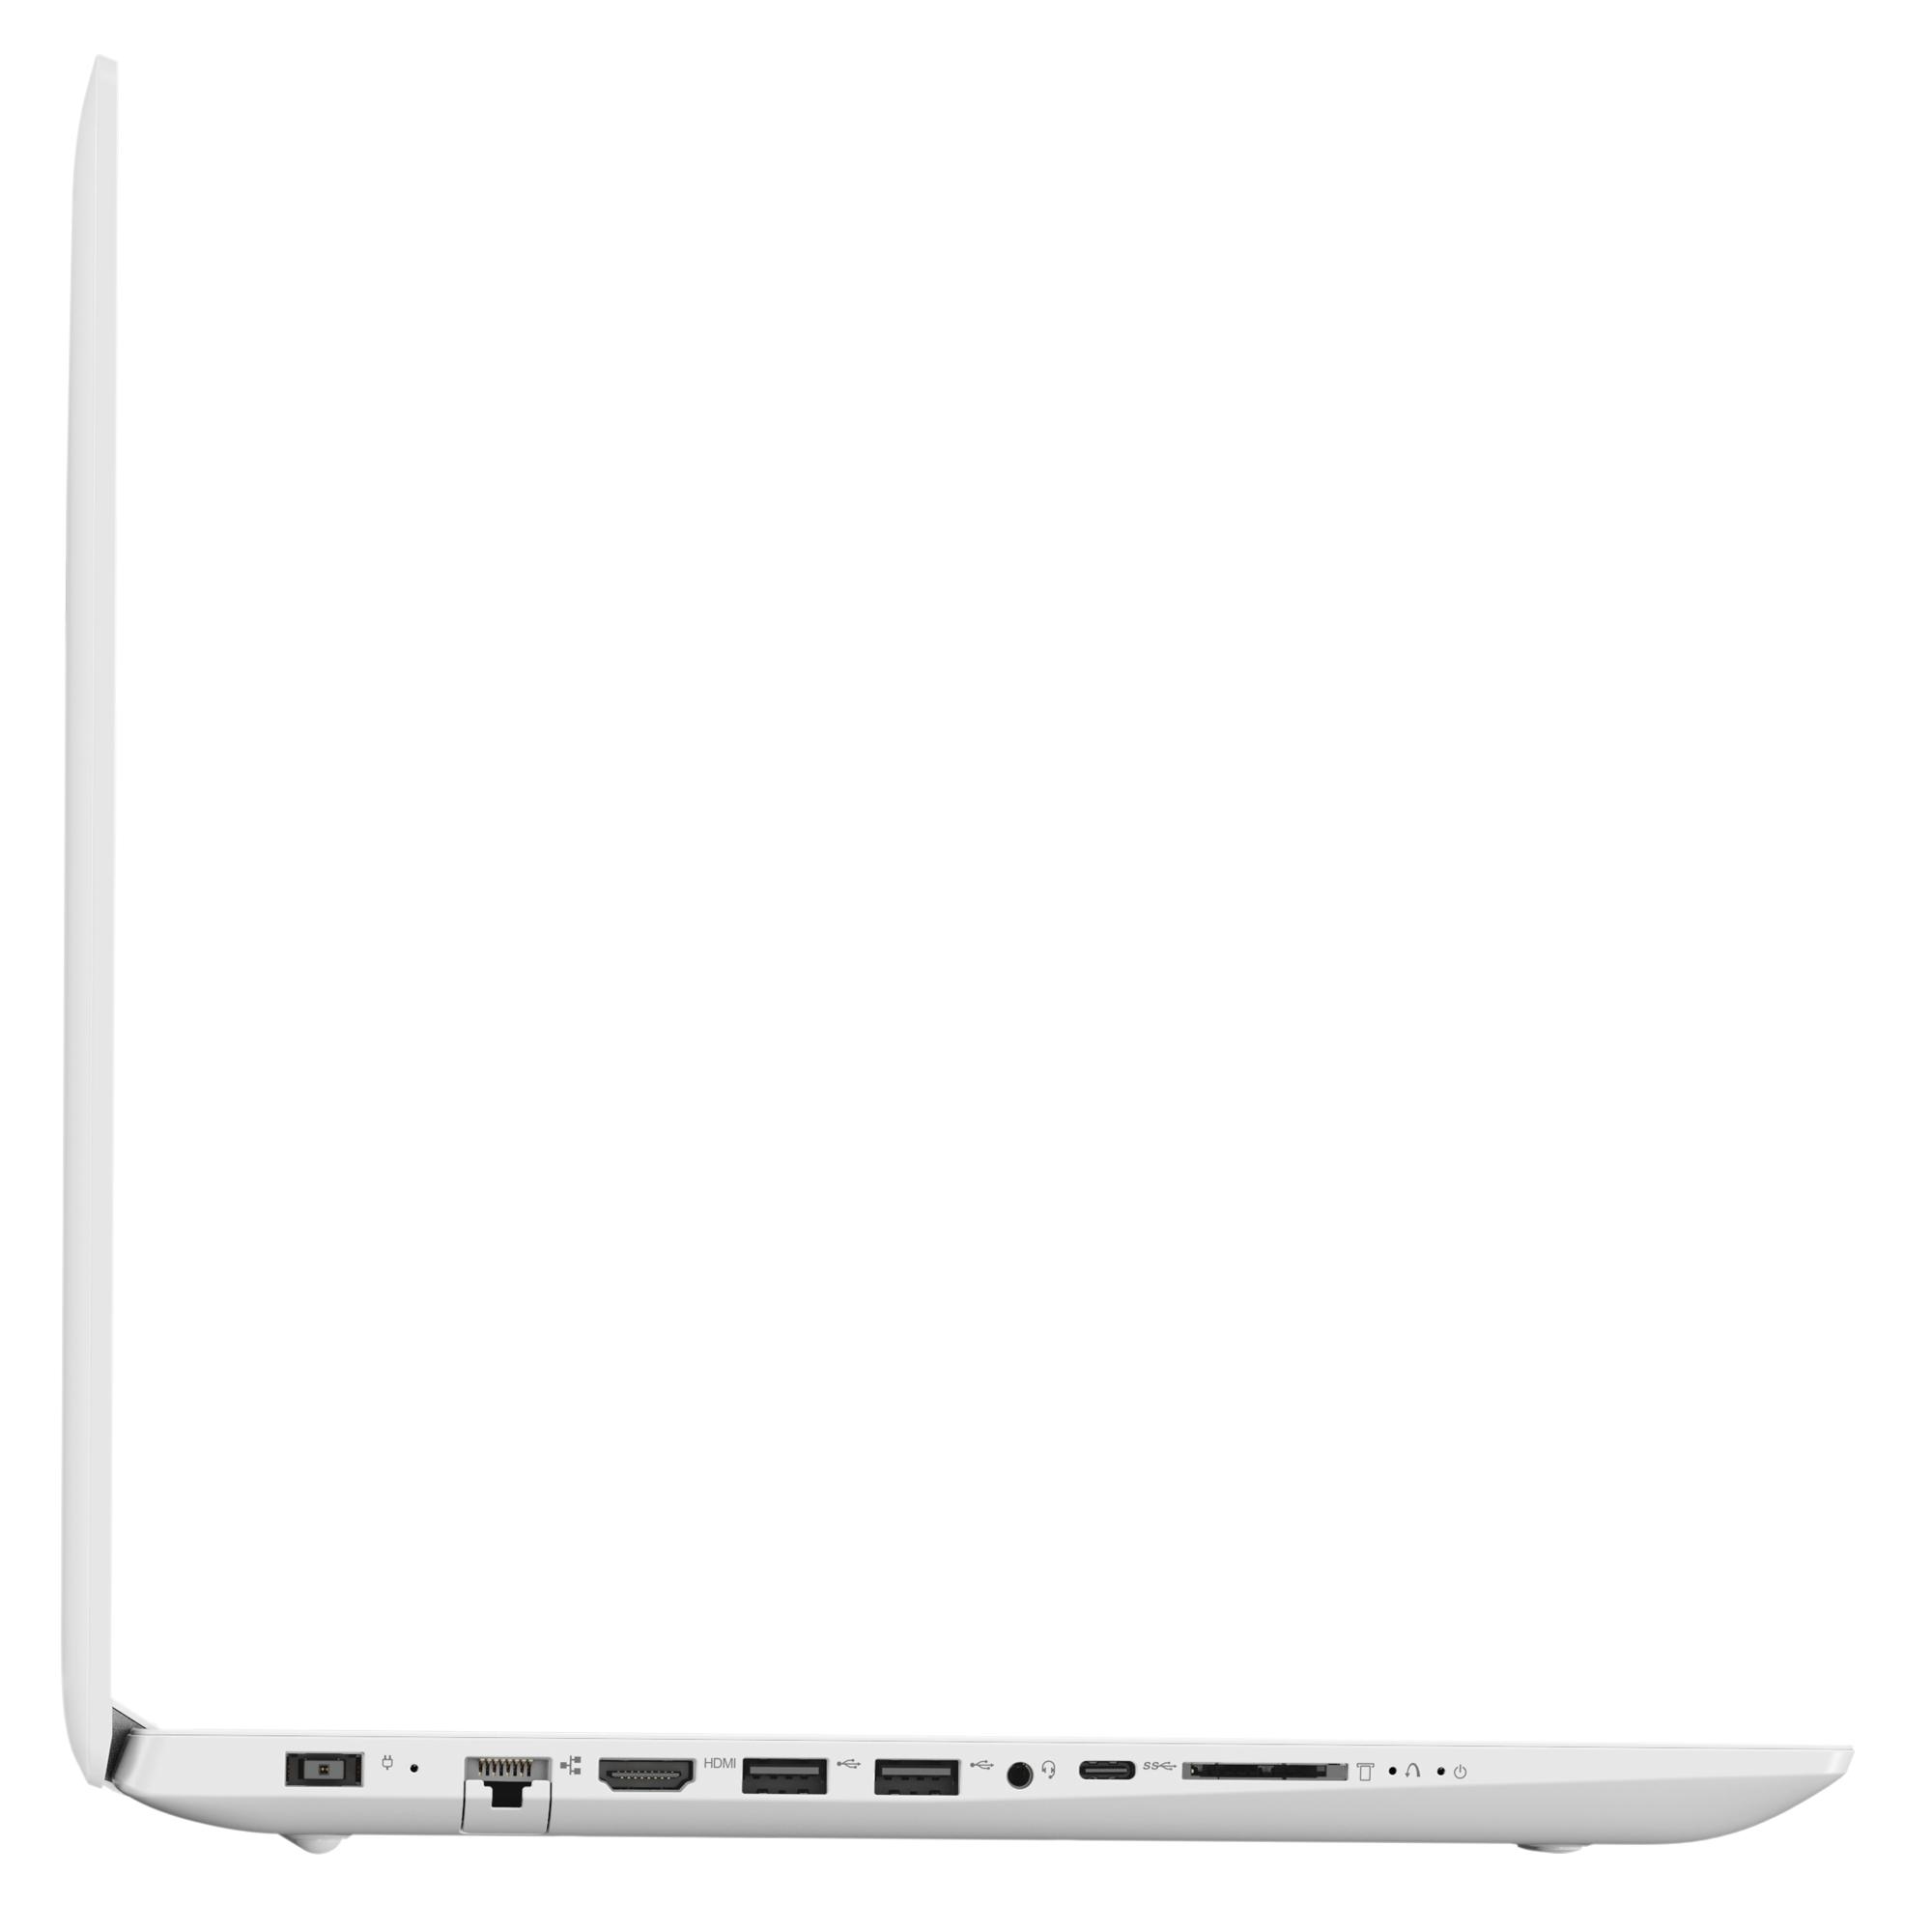 Фото  Ноутбук Lenovo ideapad 330-15 Blizzard White (81D100M6RA)